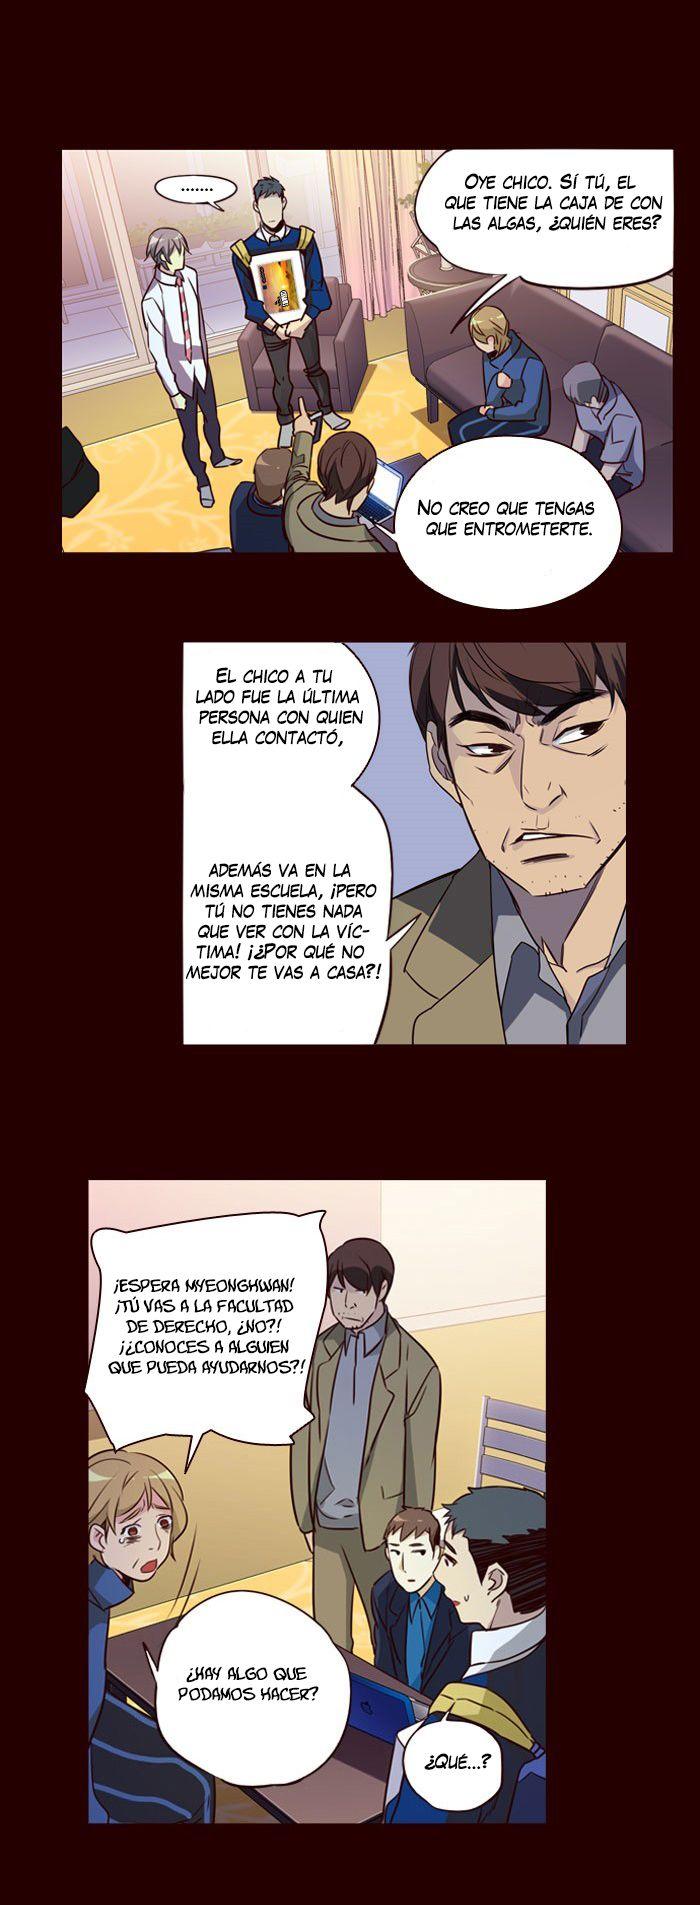 http://c5.ninemanga.com/es_manga/32/416/459595/c95192fae3dee1111325172a910a2fb4.jpg Page 7